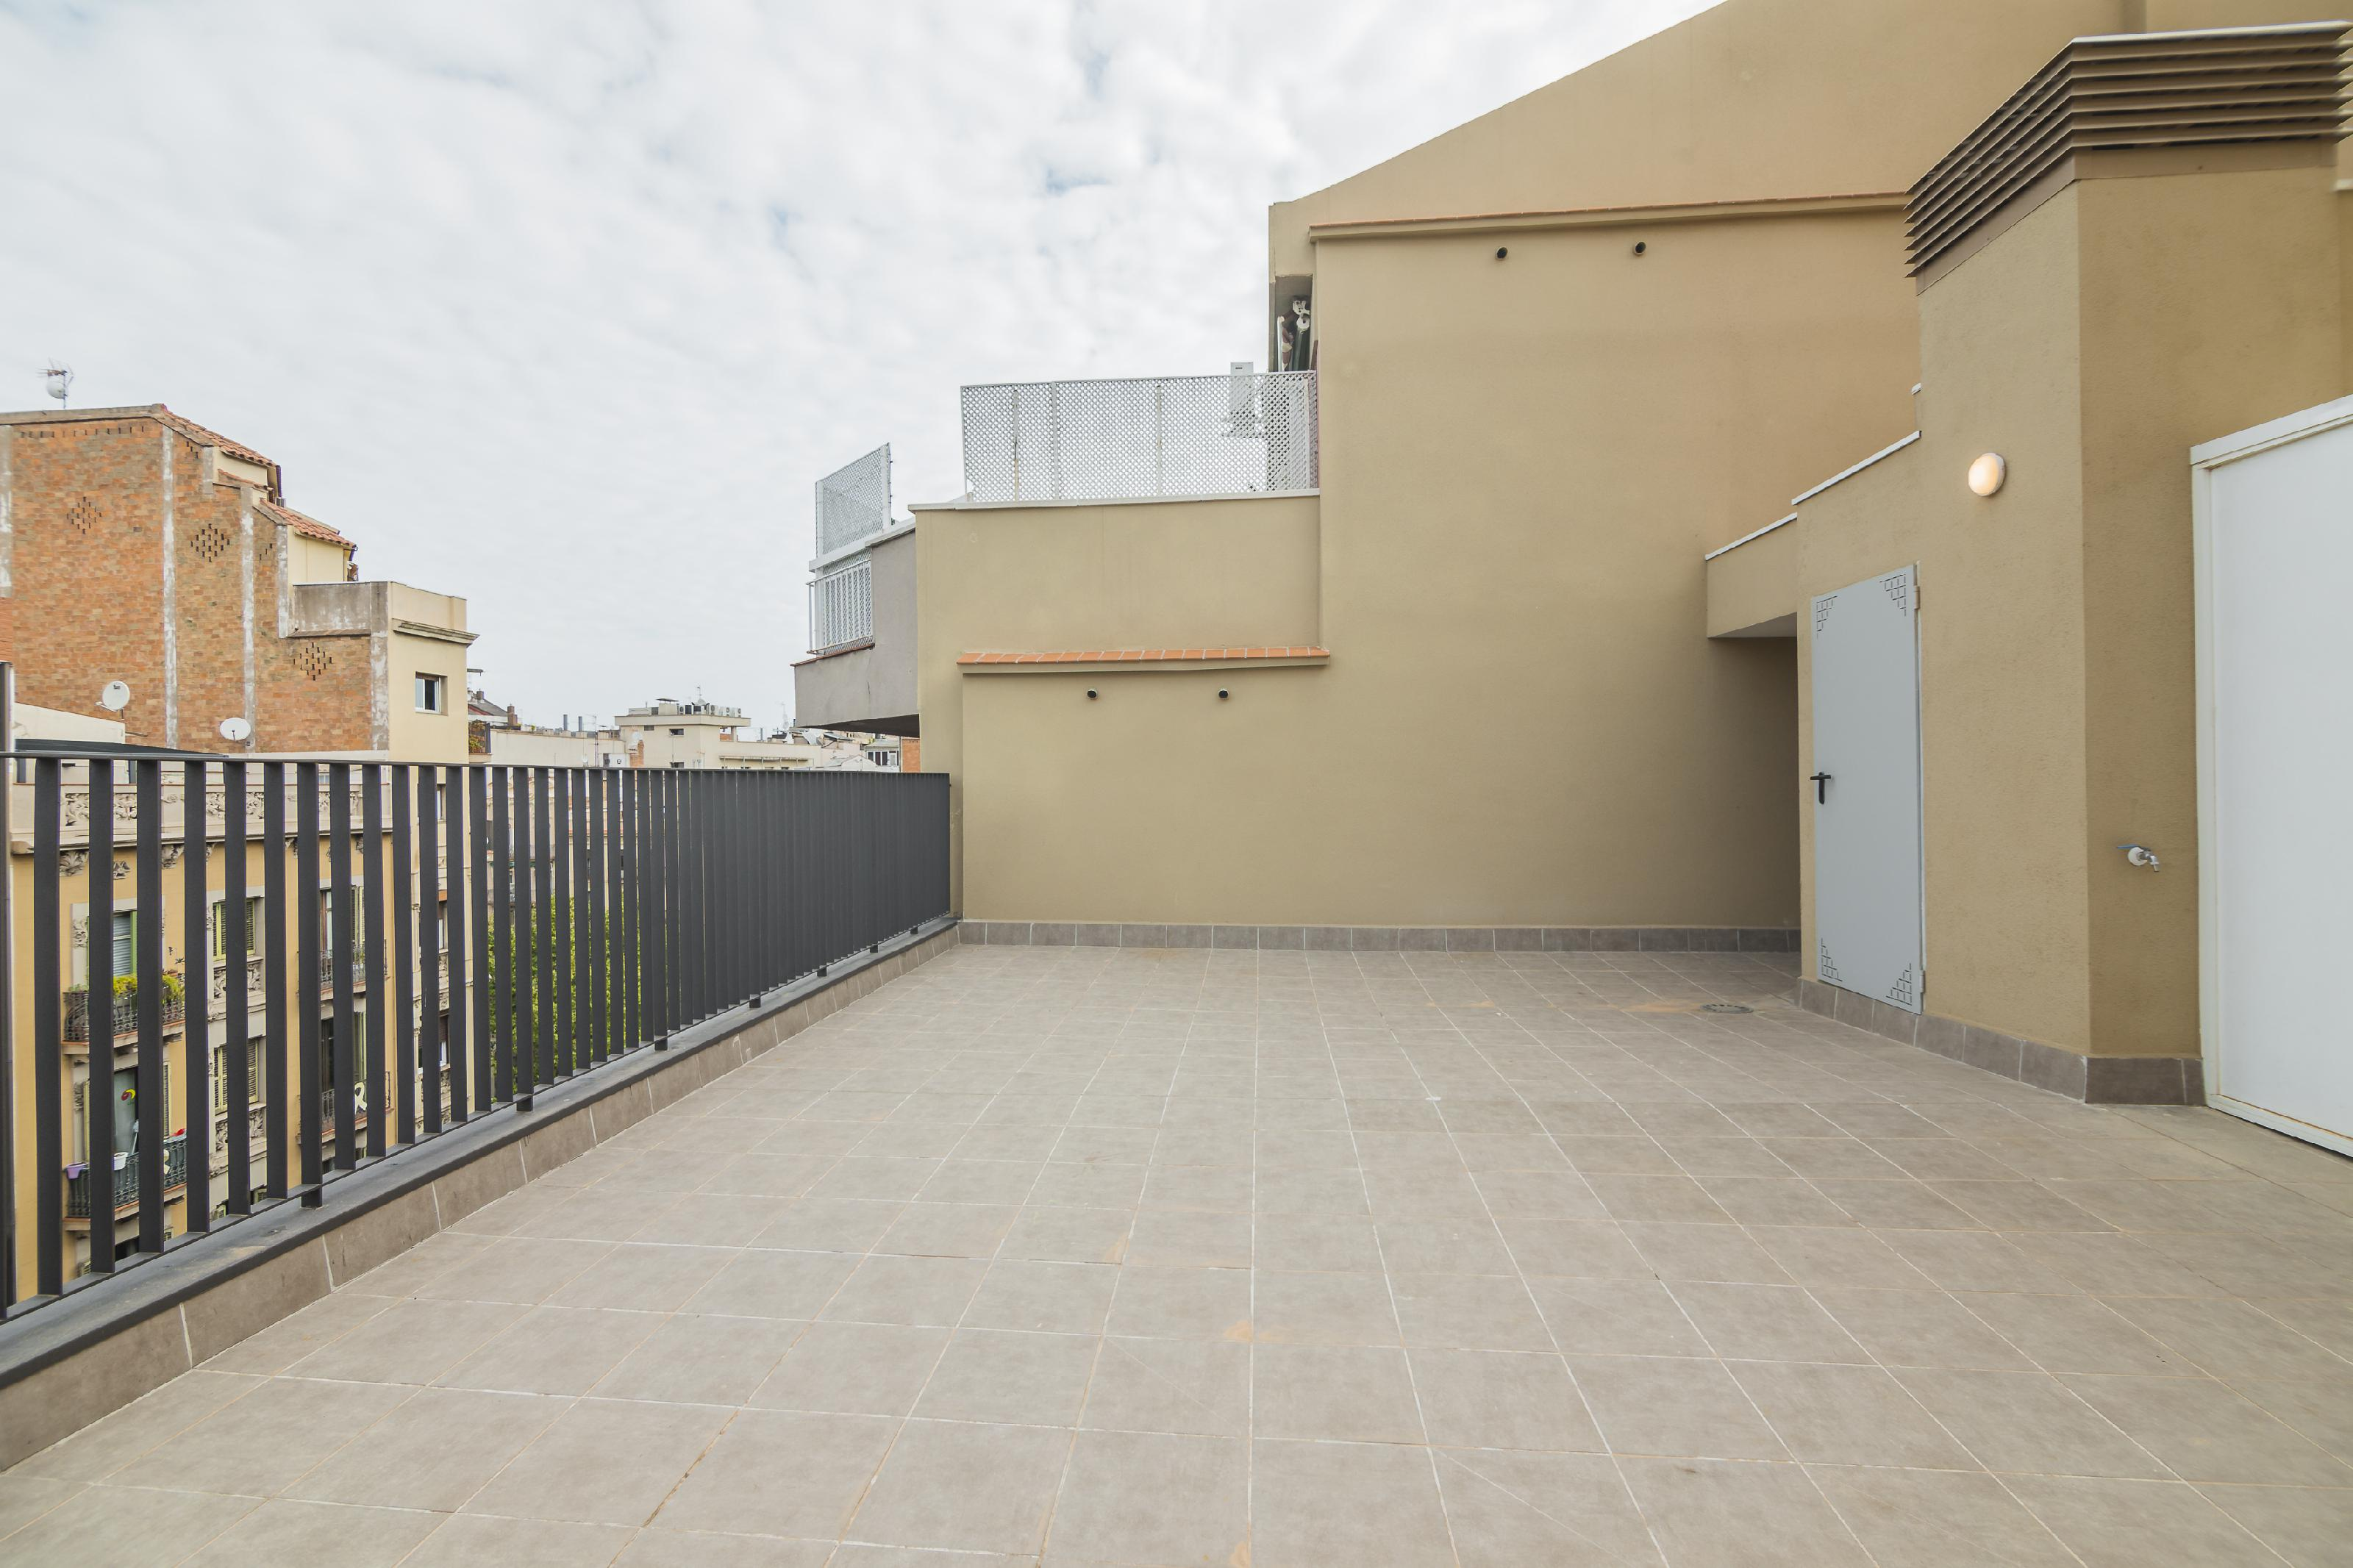 249311 Flat for sale in Eixample, Nova Esquerra Eixample 24